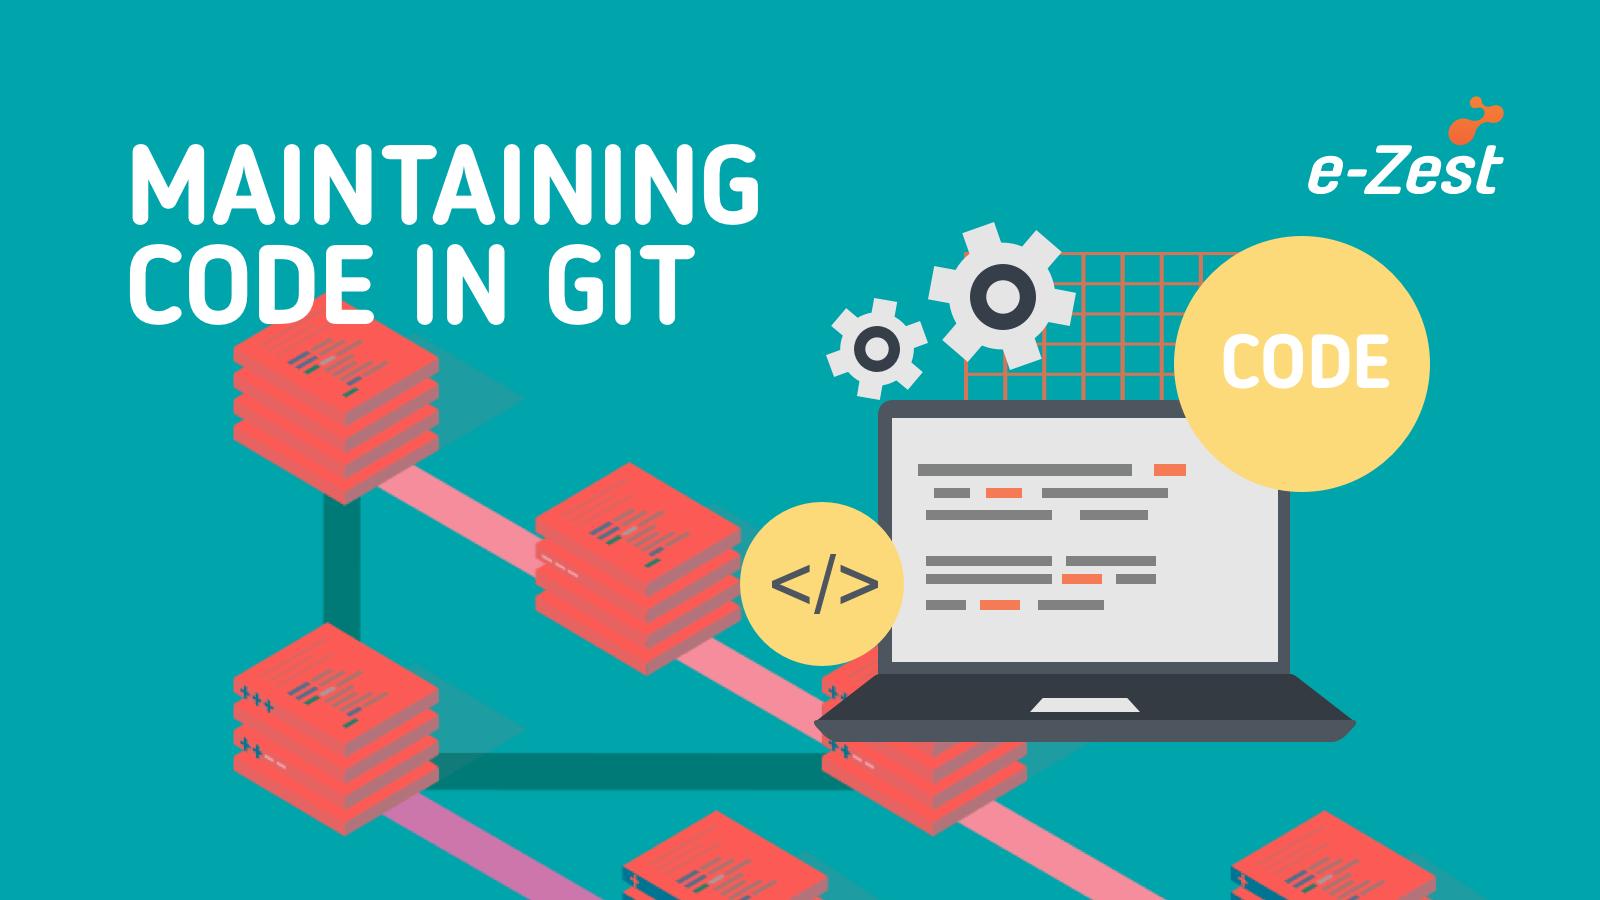 Maintaining Code in GIT